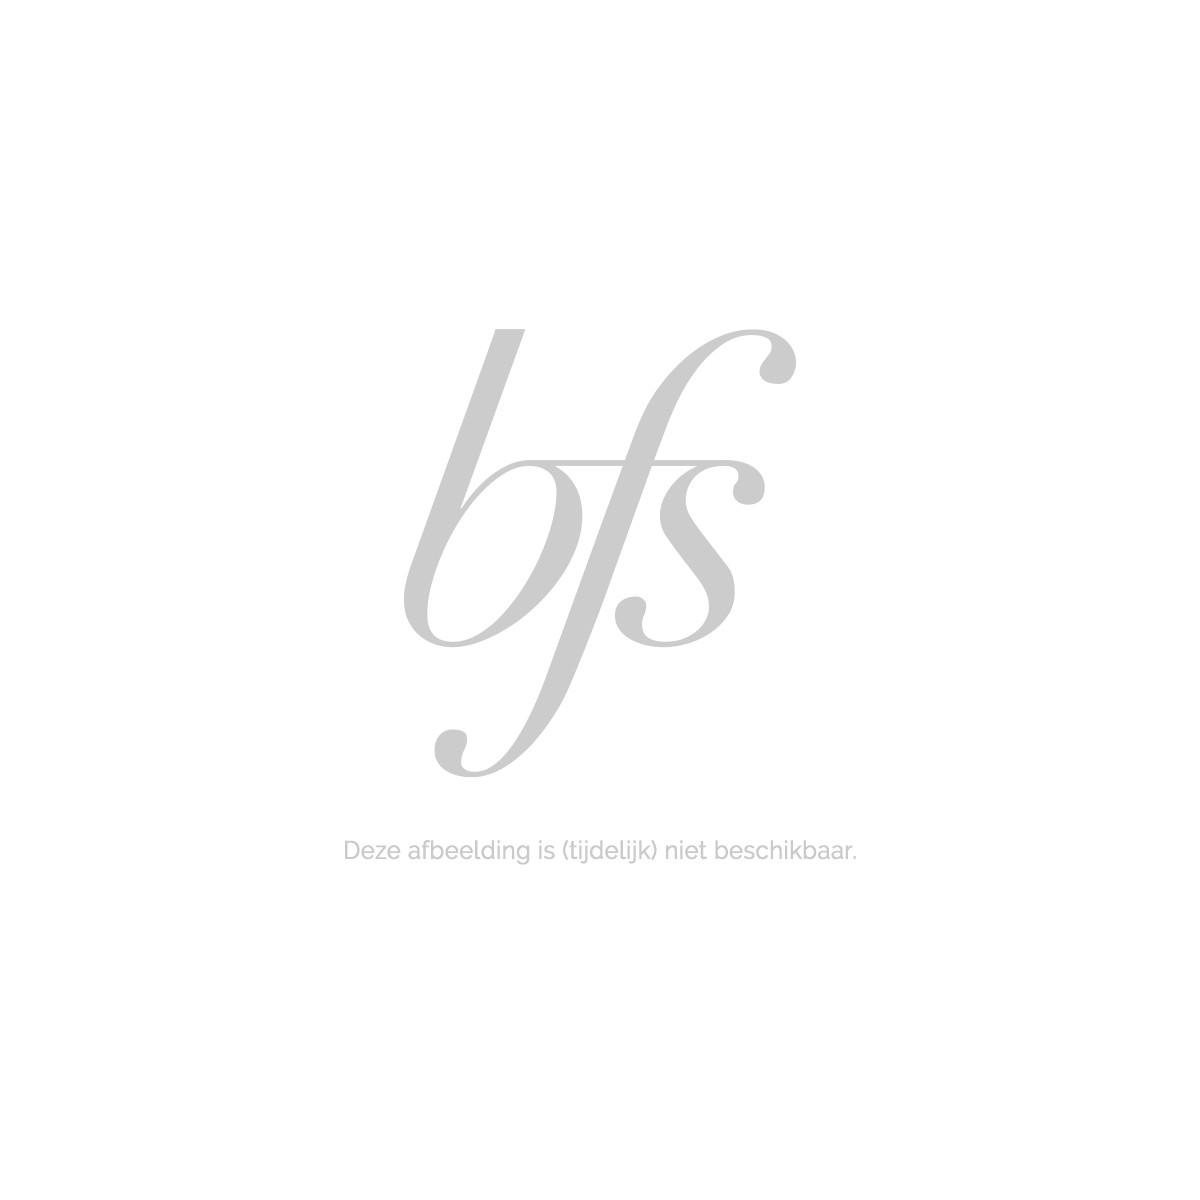 Bourjois Eyeliner Slim Liner Feutre Ultra Black